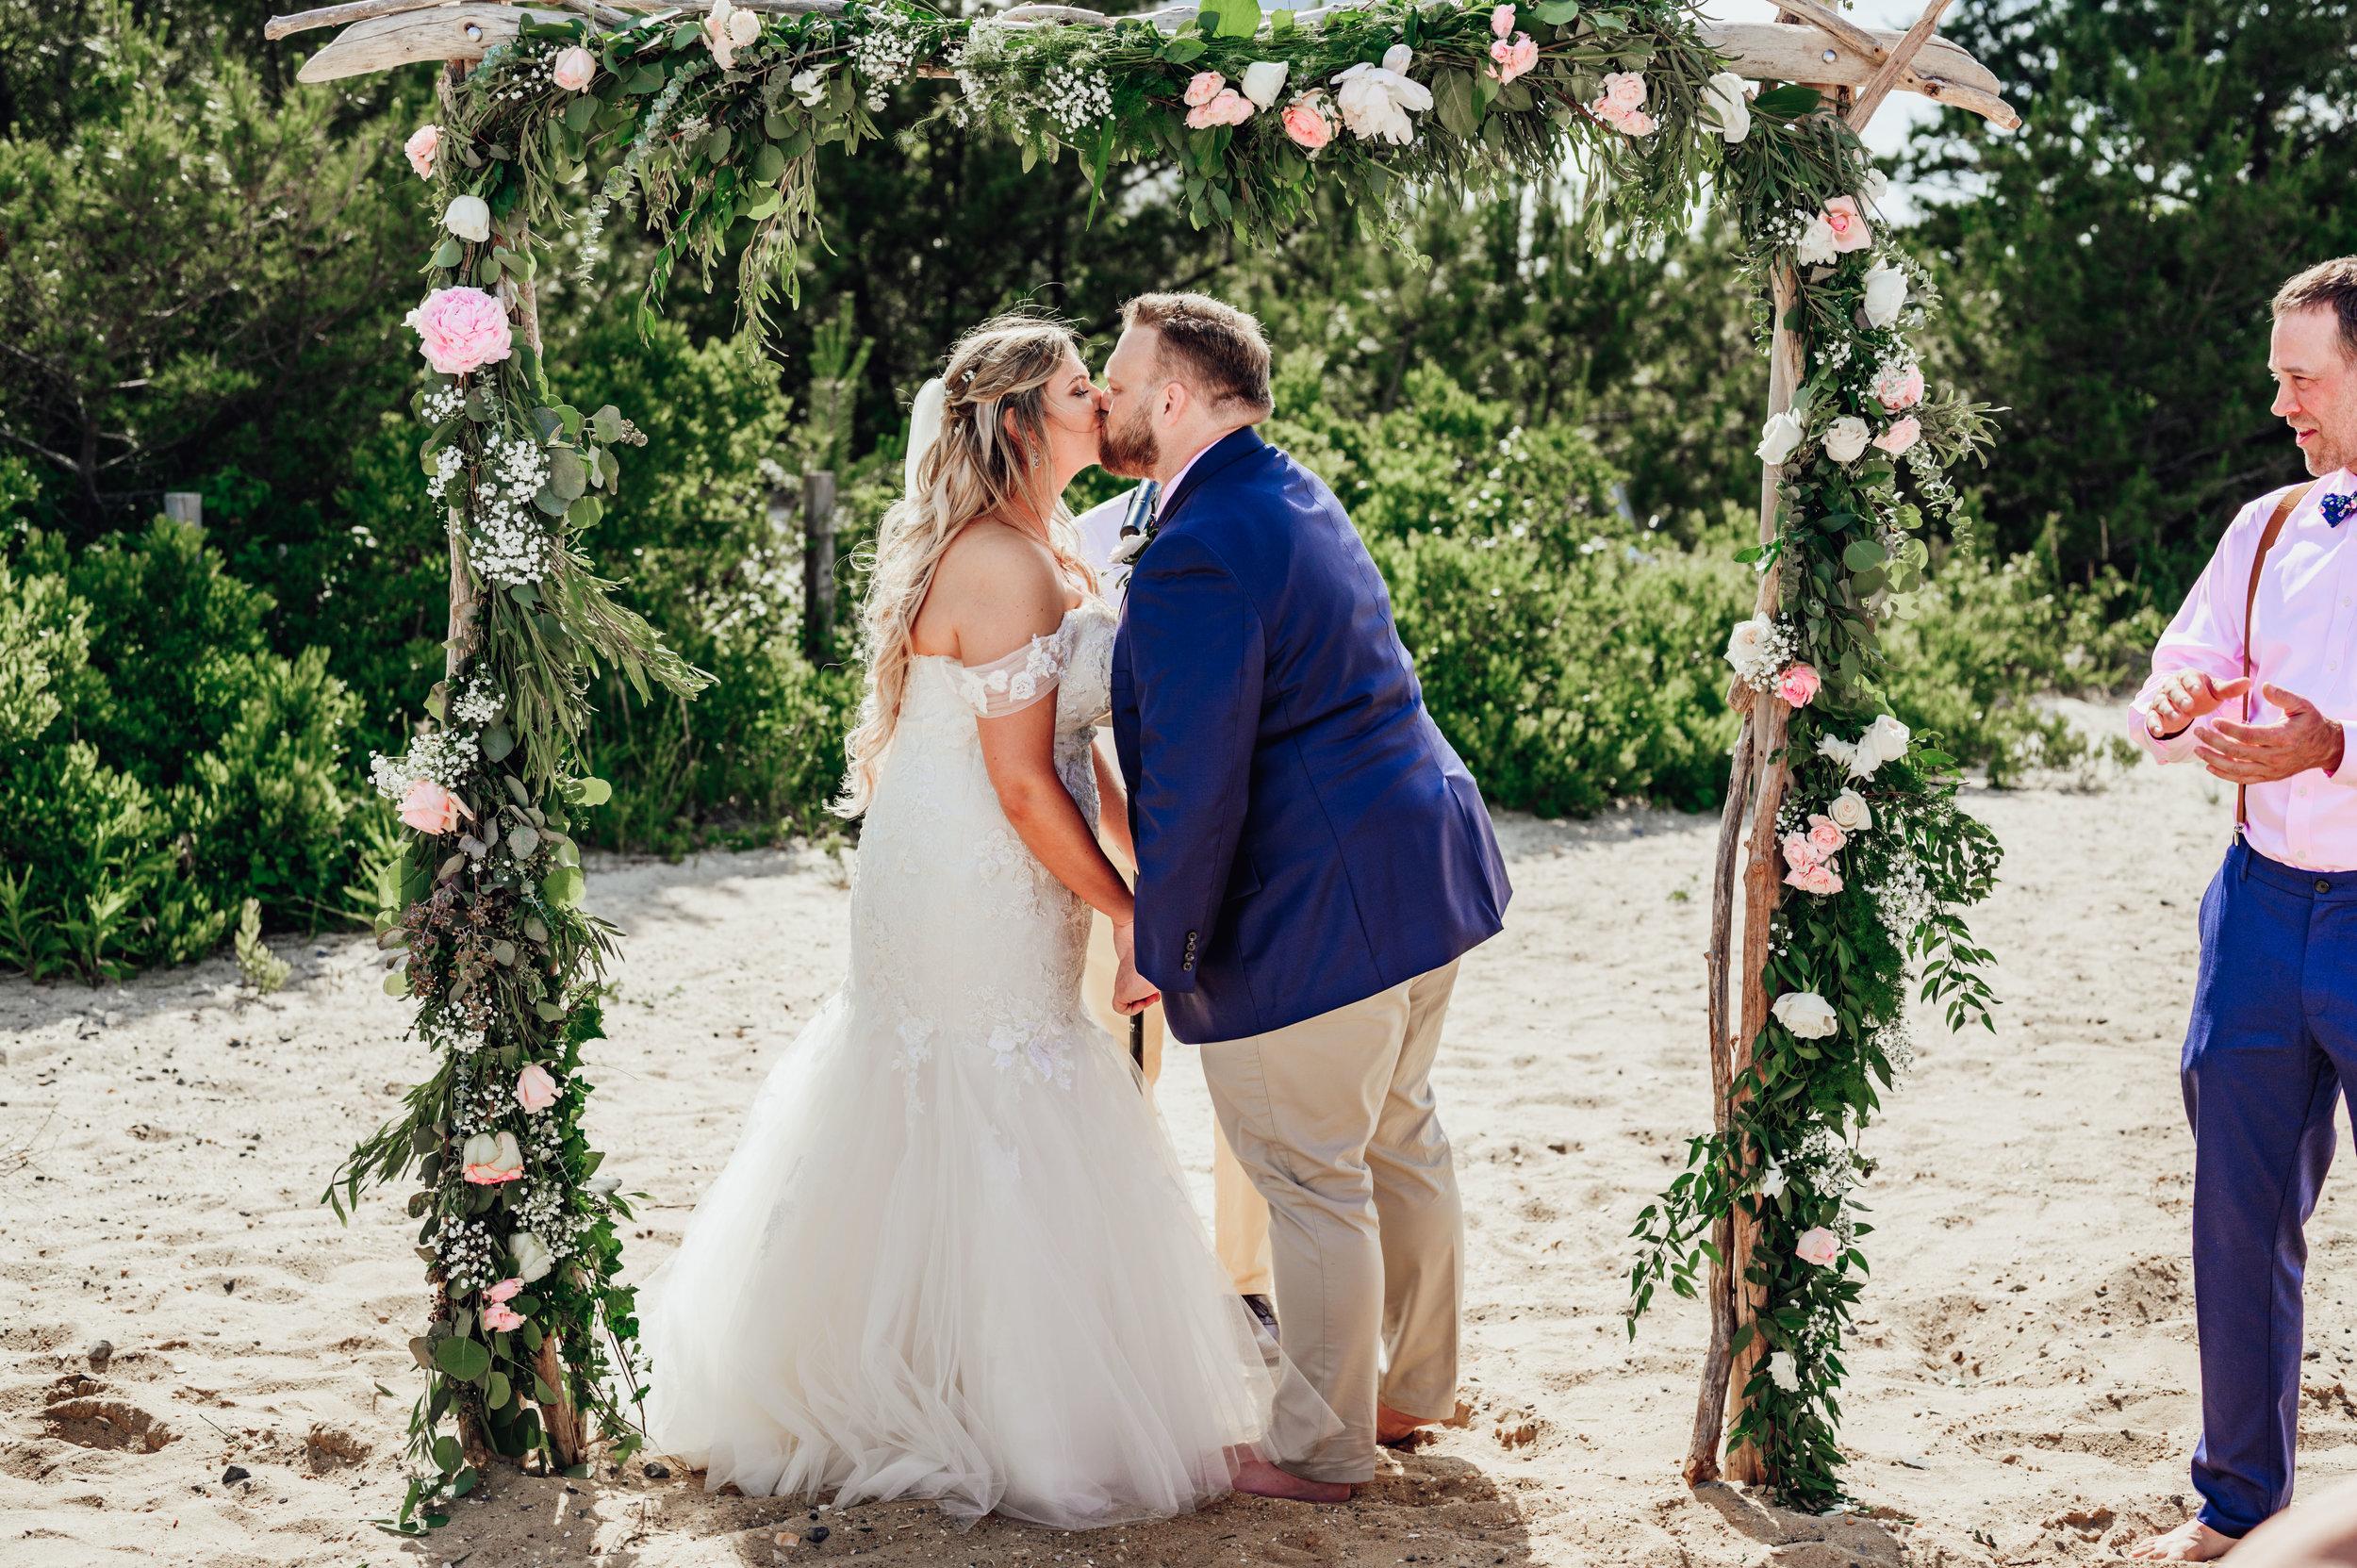 New Jersey Wedding Photographer, Felsberg Photography LBI wedding photography 73.jpg